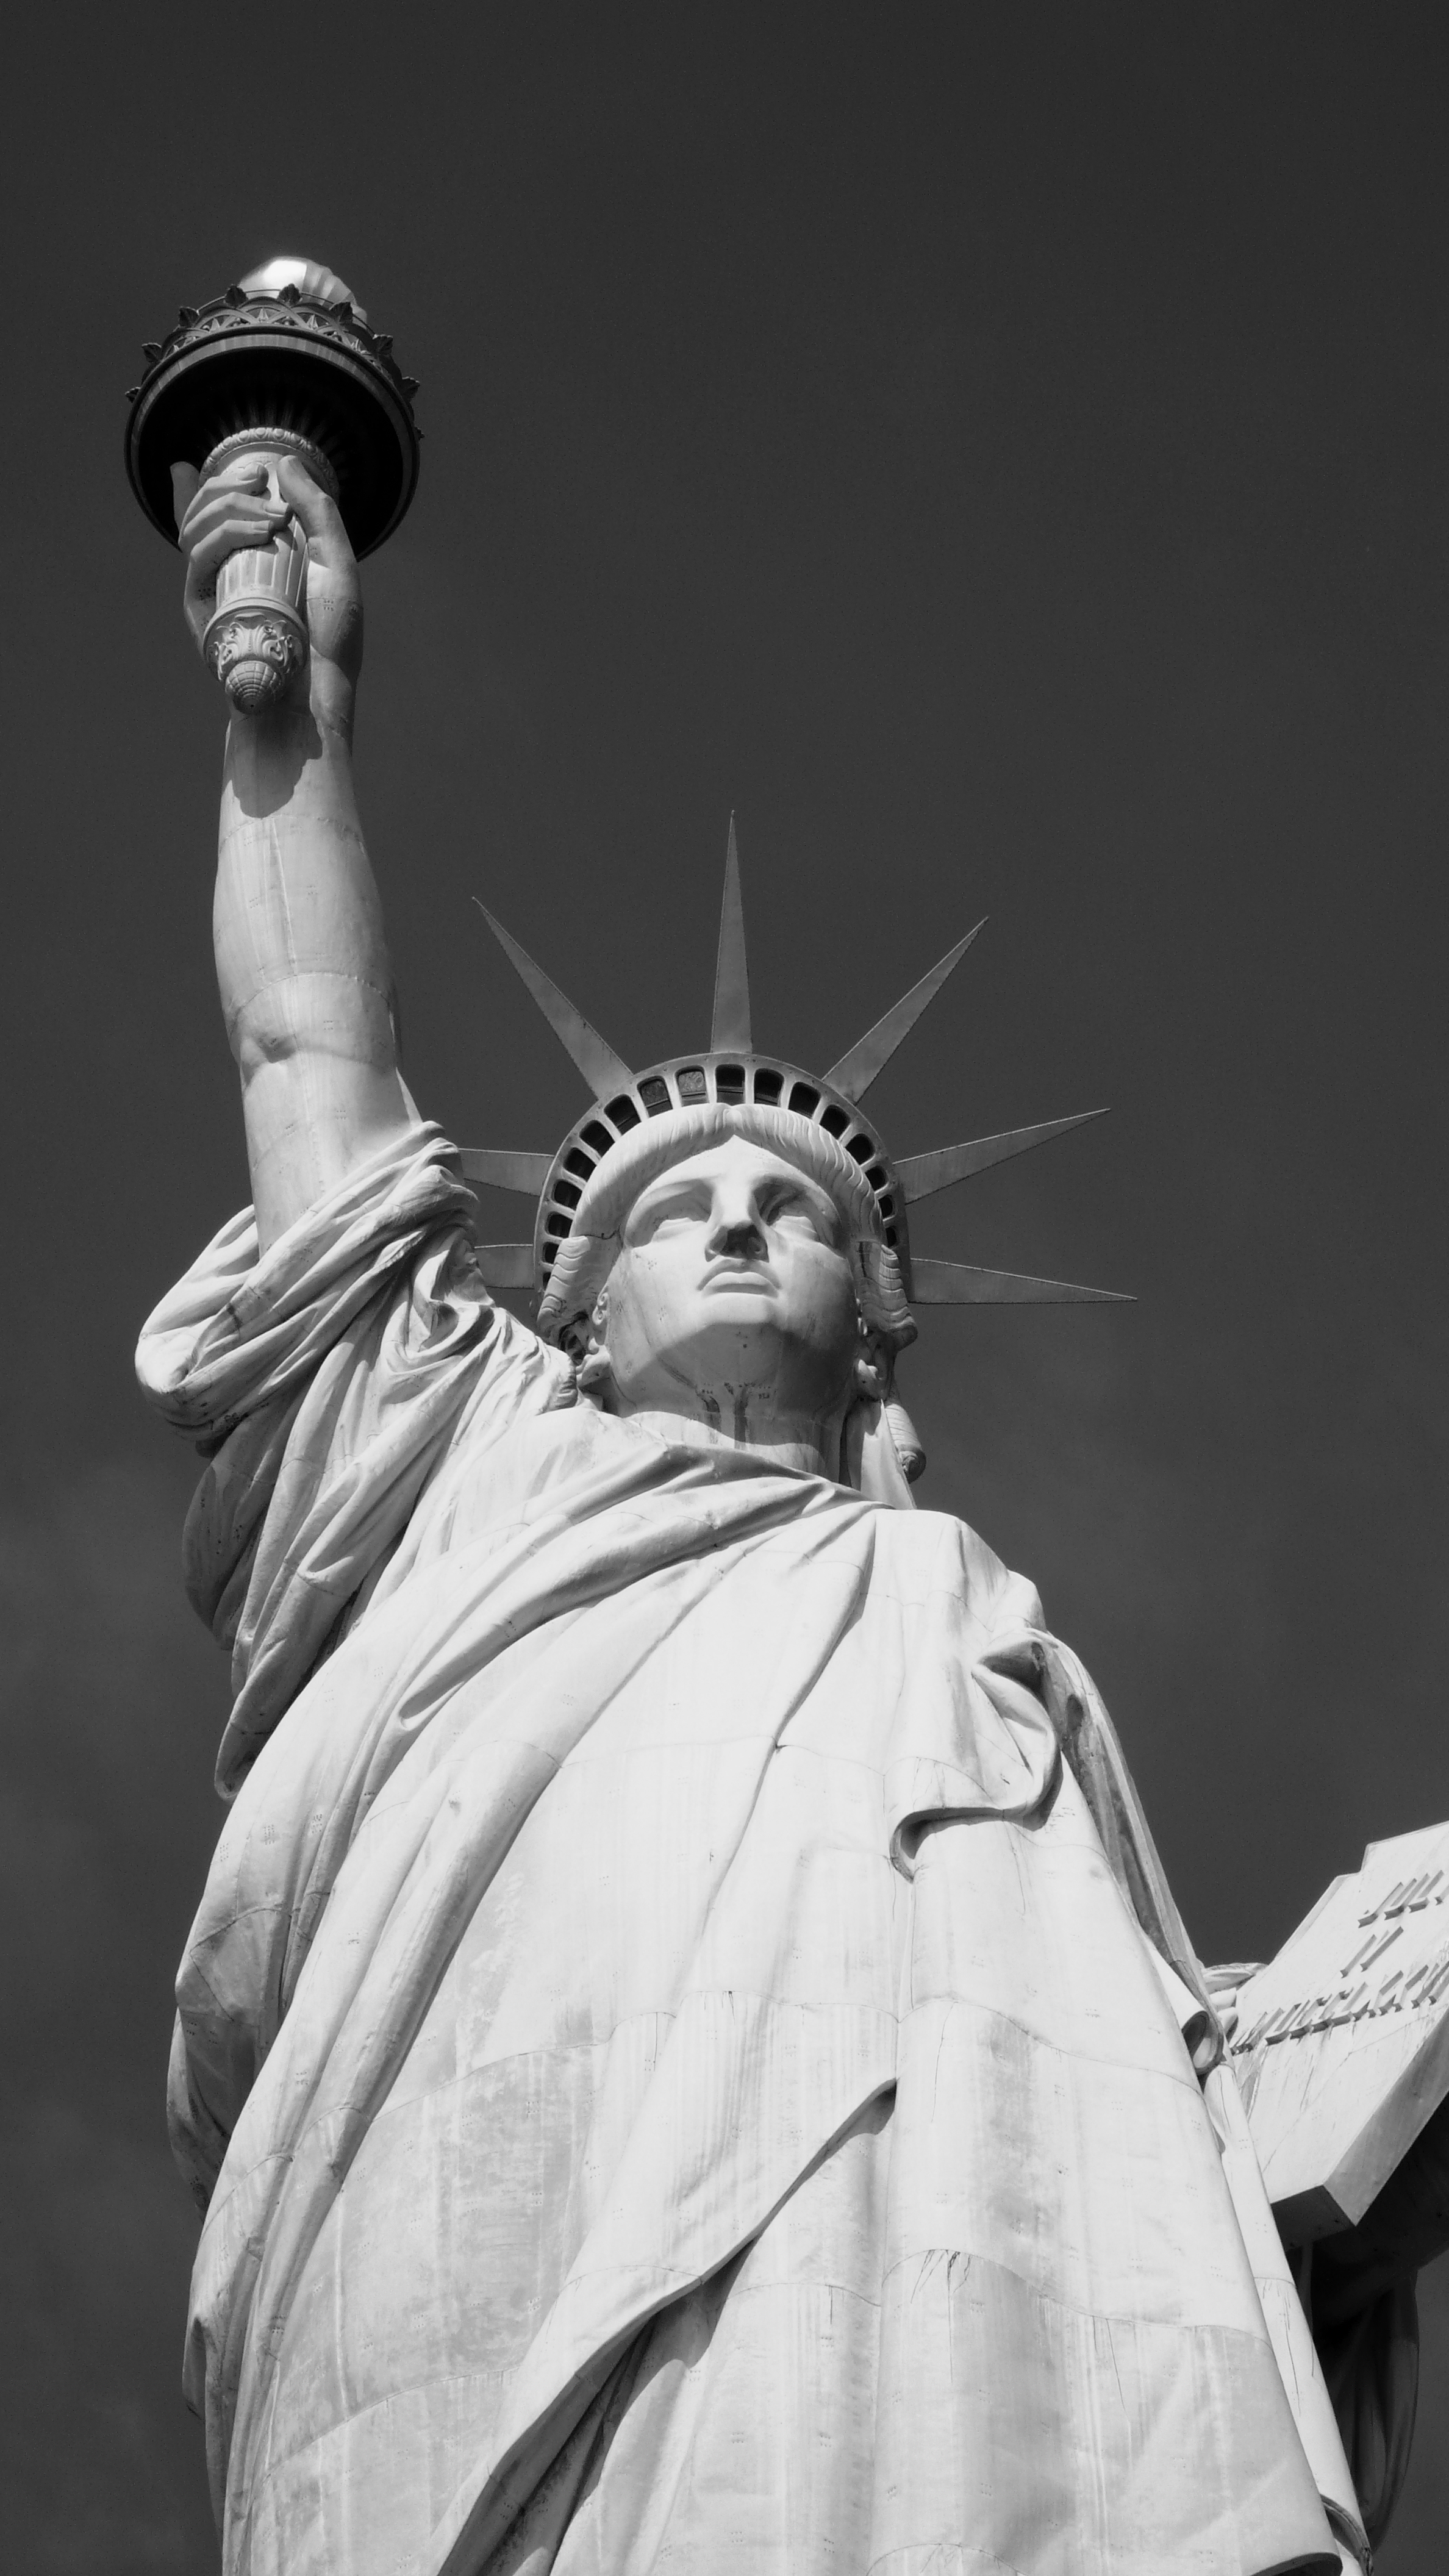 W liberty